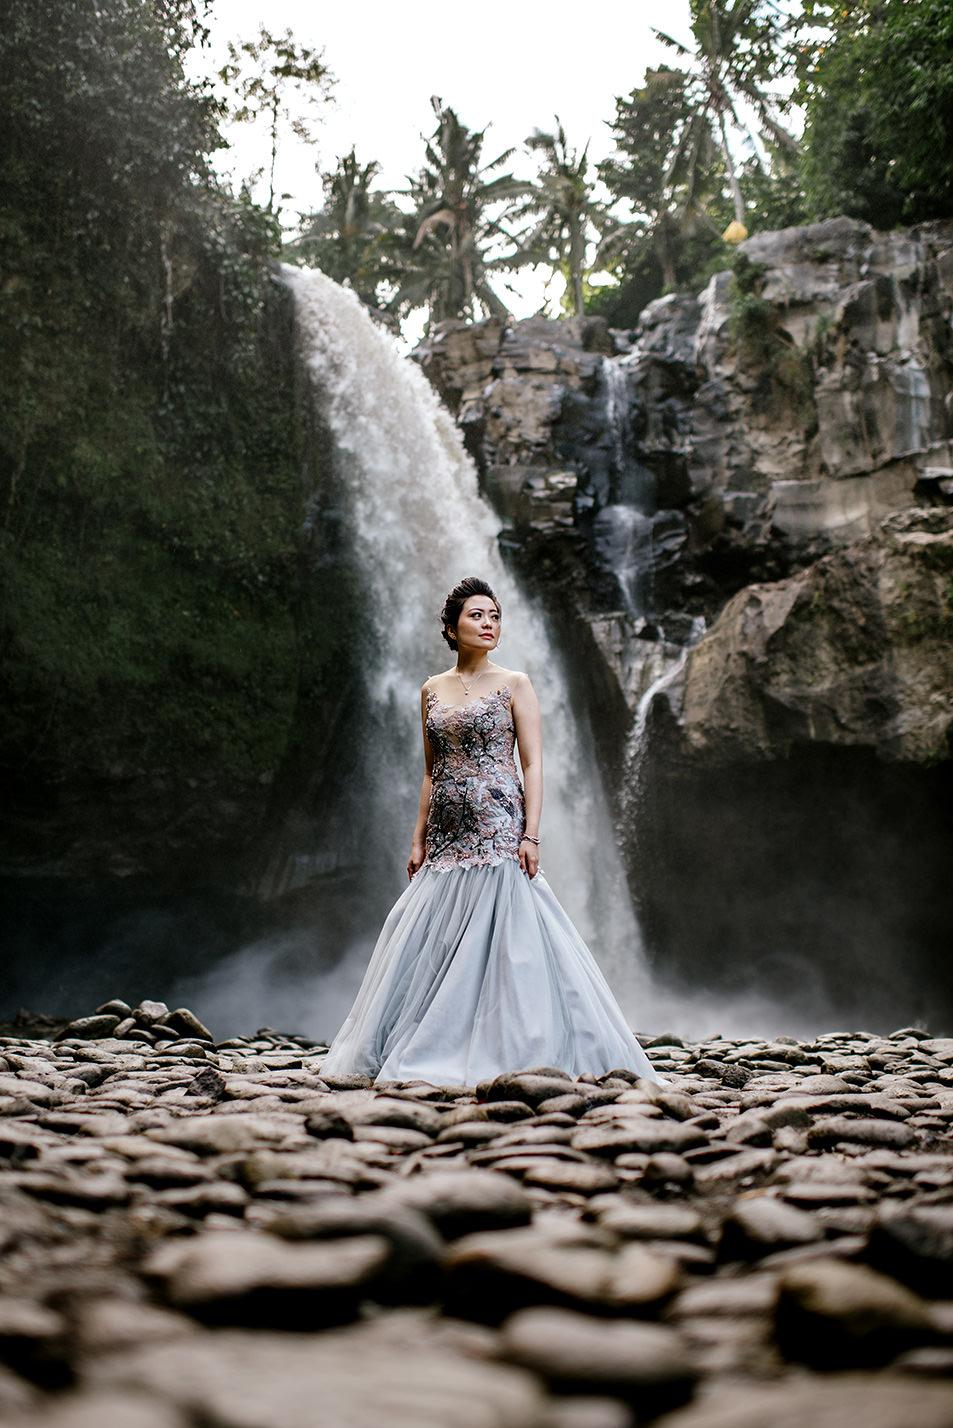 Bali-waterfall-engagment-Bali-wedding-photographer02.jpg